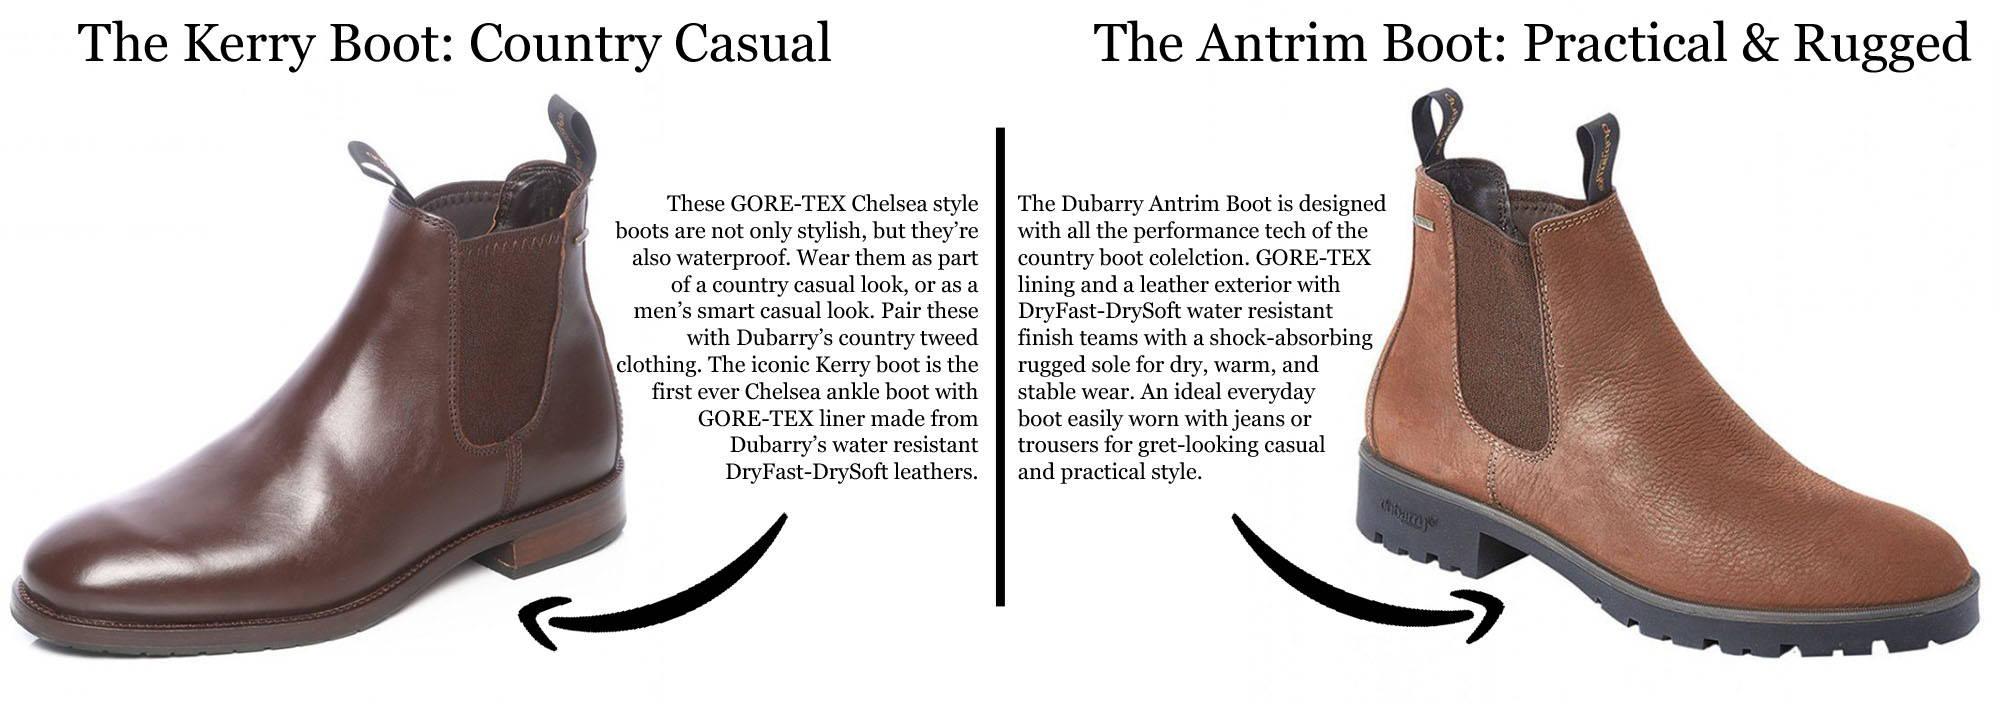 Dubarry Antrim Boots